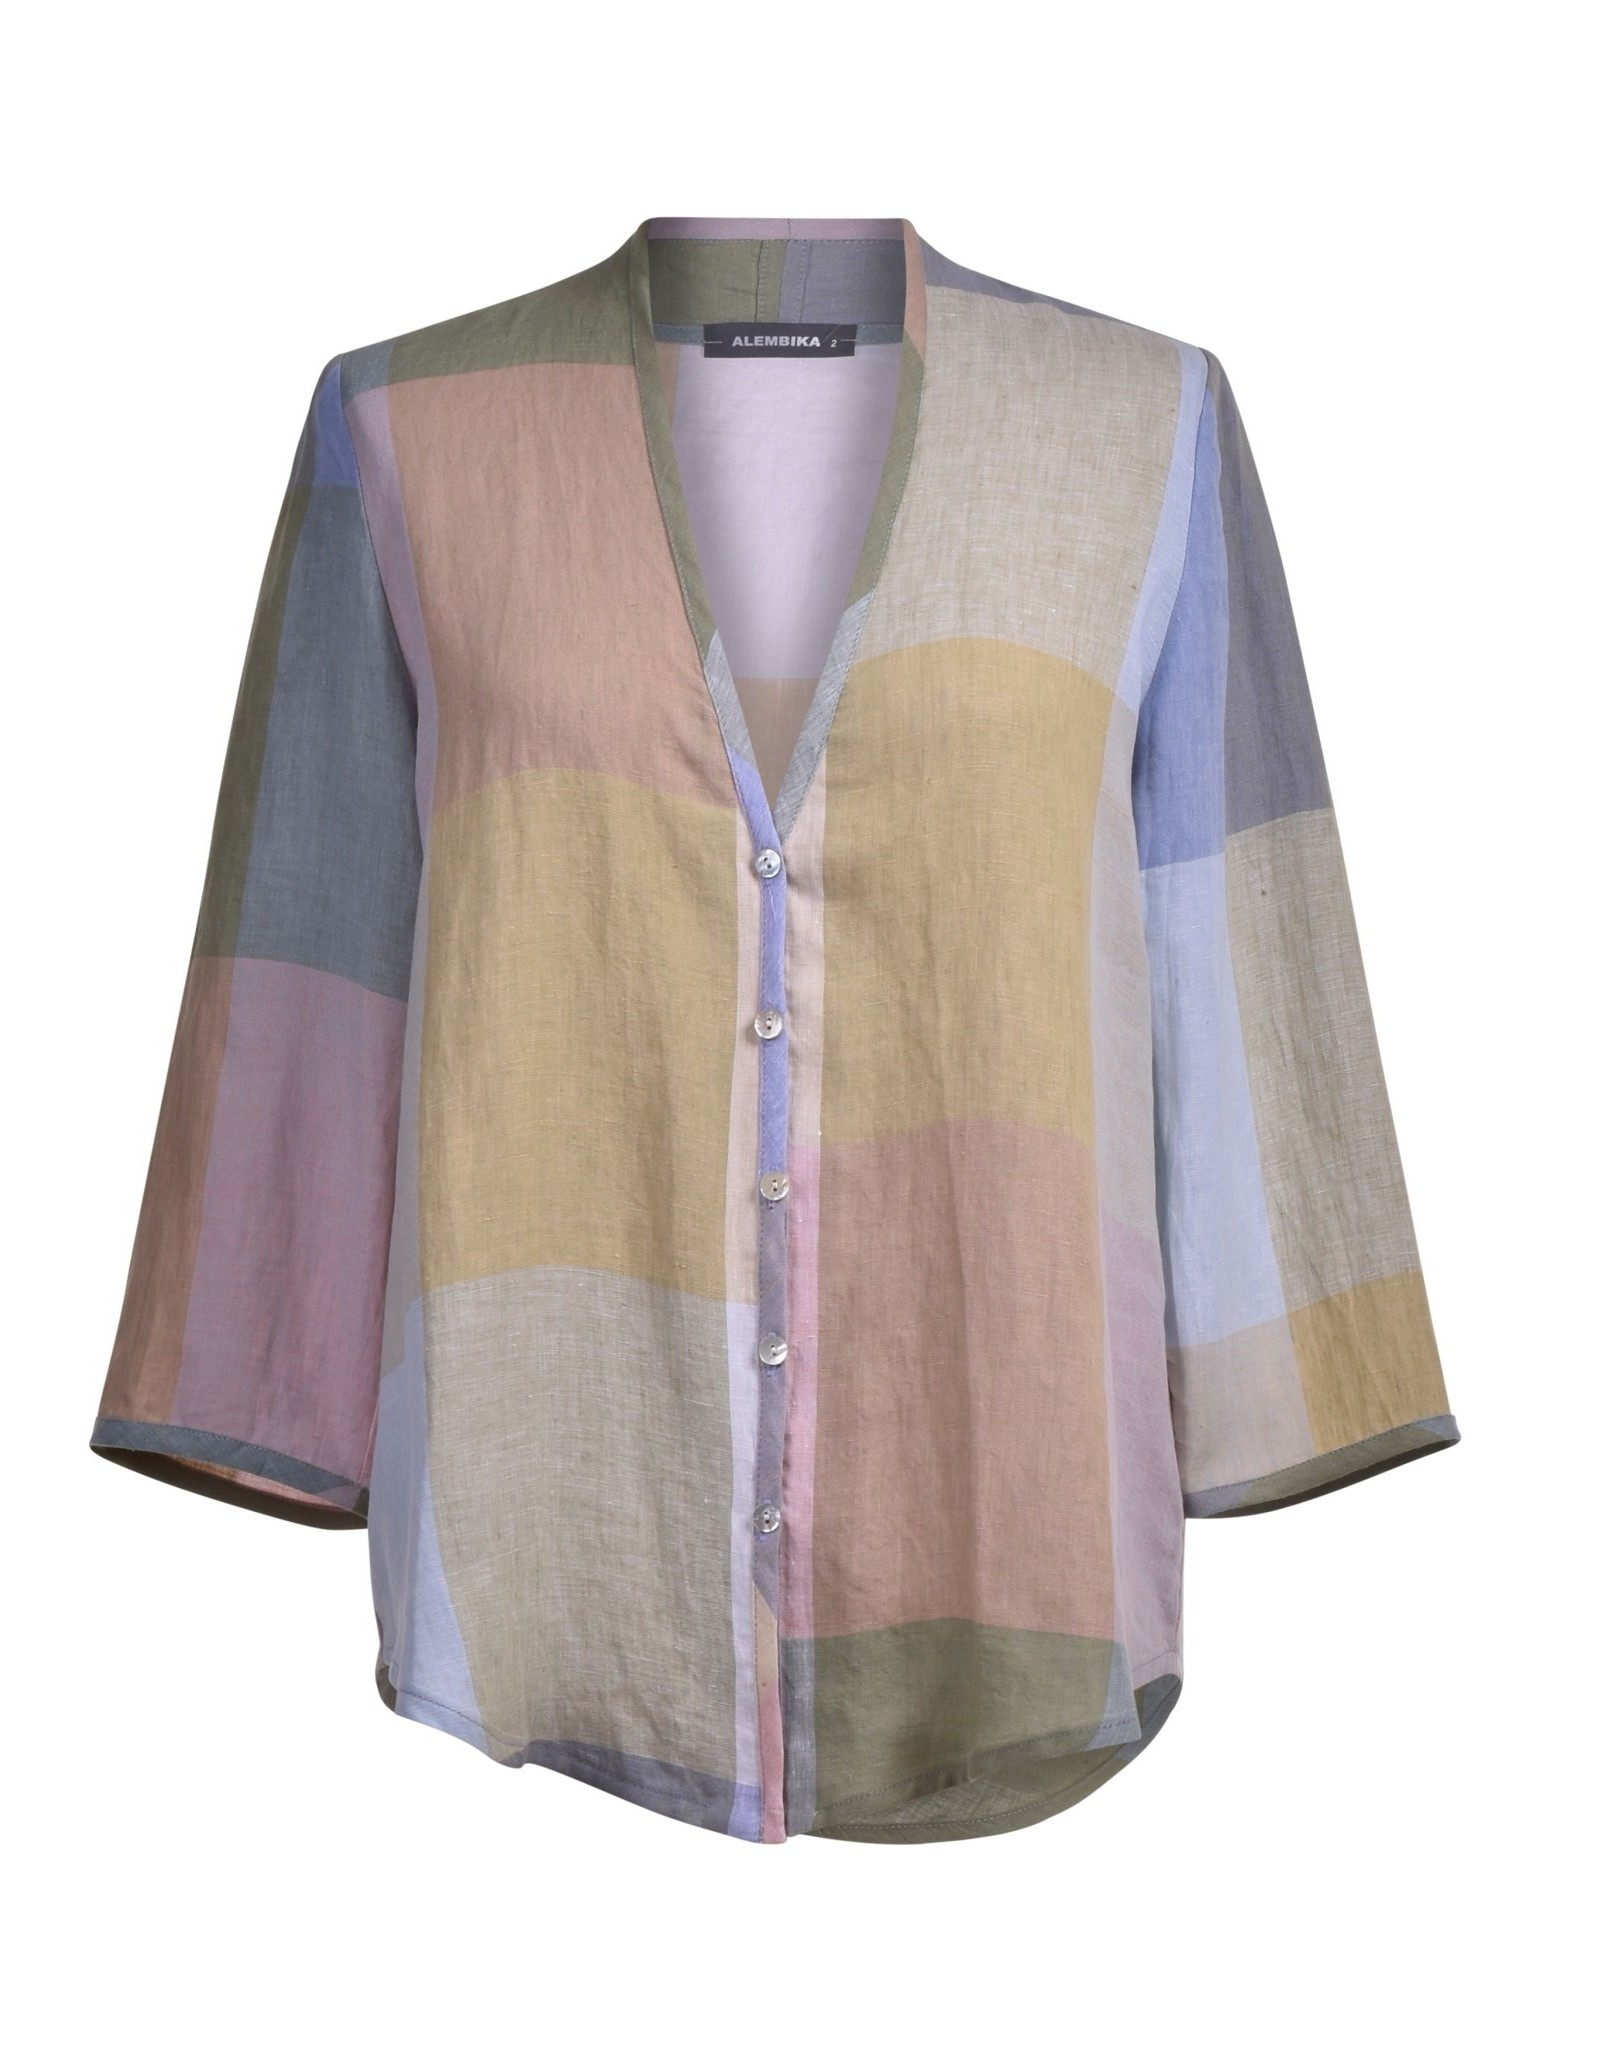 ALEMBIKA st203p long sleeve button down shirt